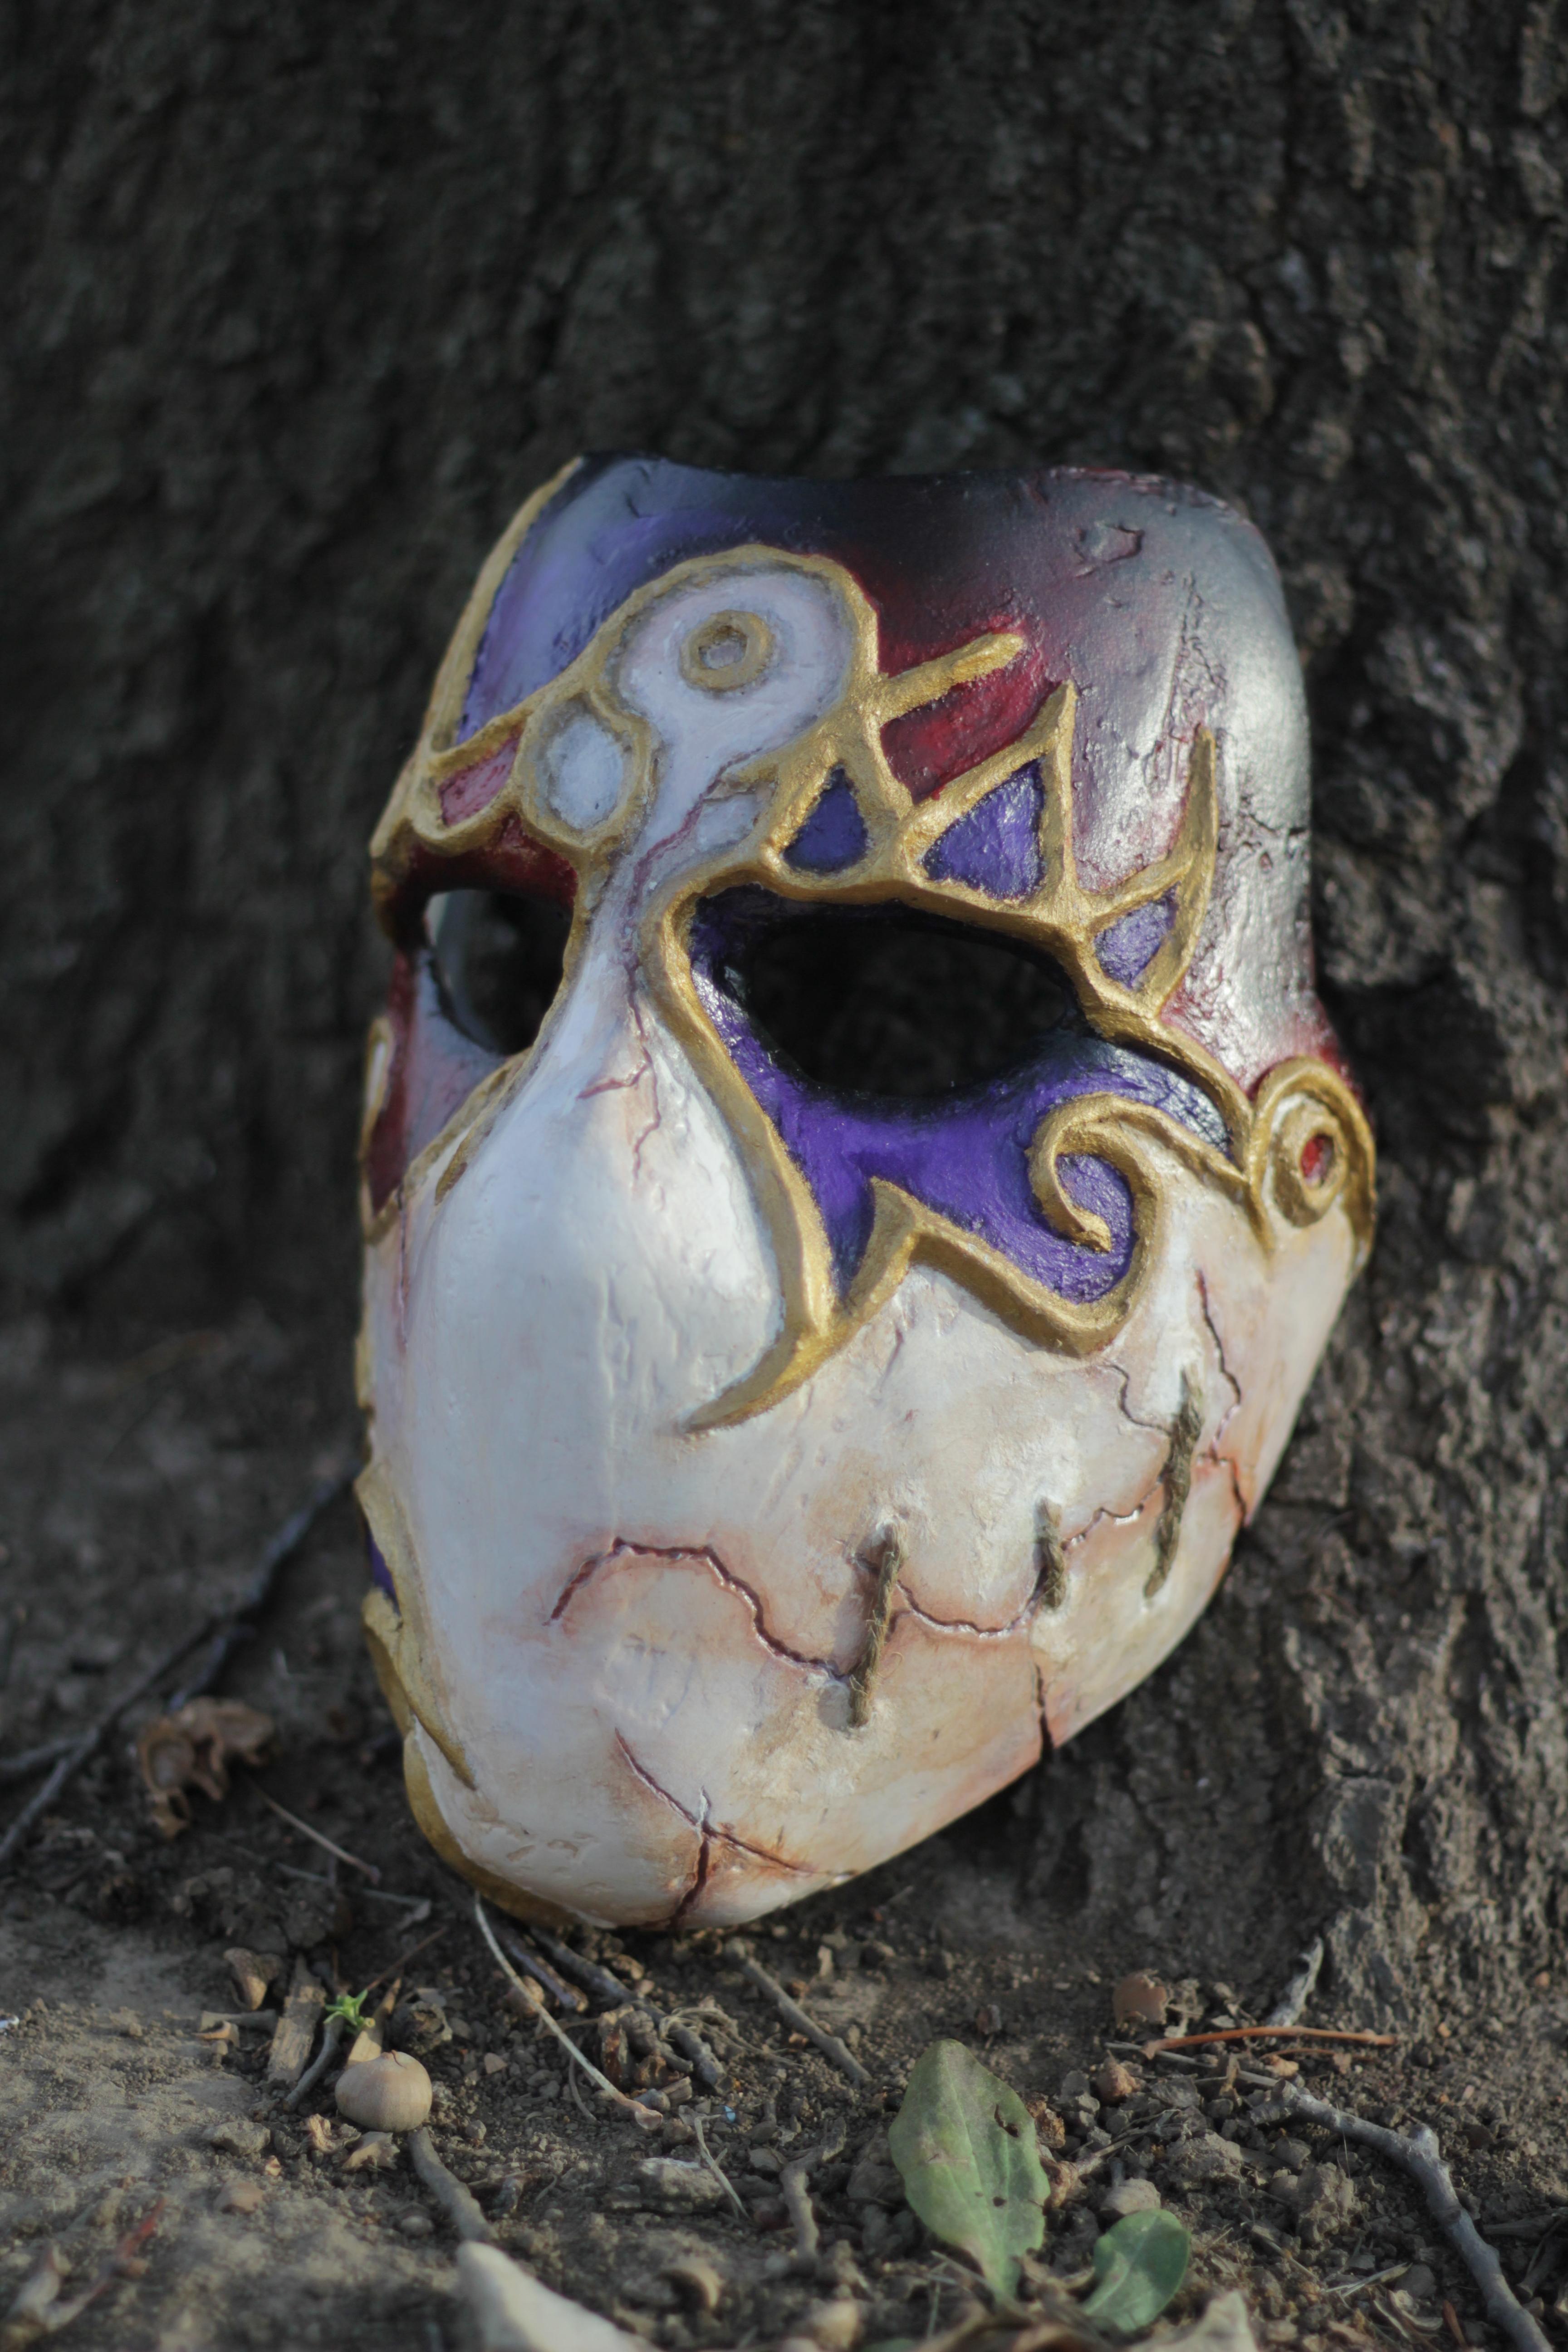 Jack of Blades Mask stitches by nicholasKaighen